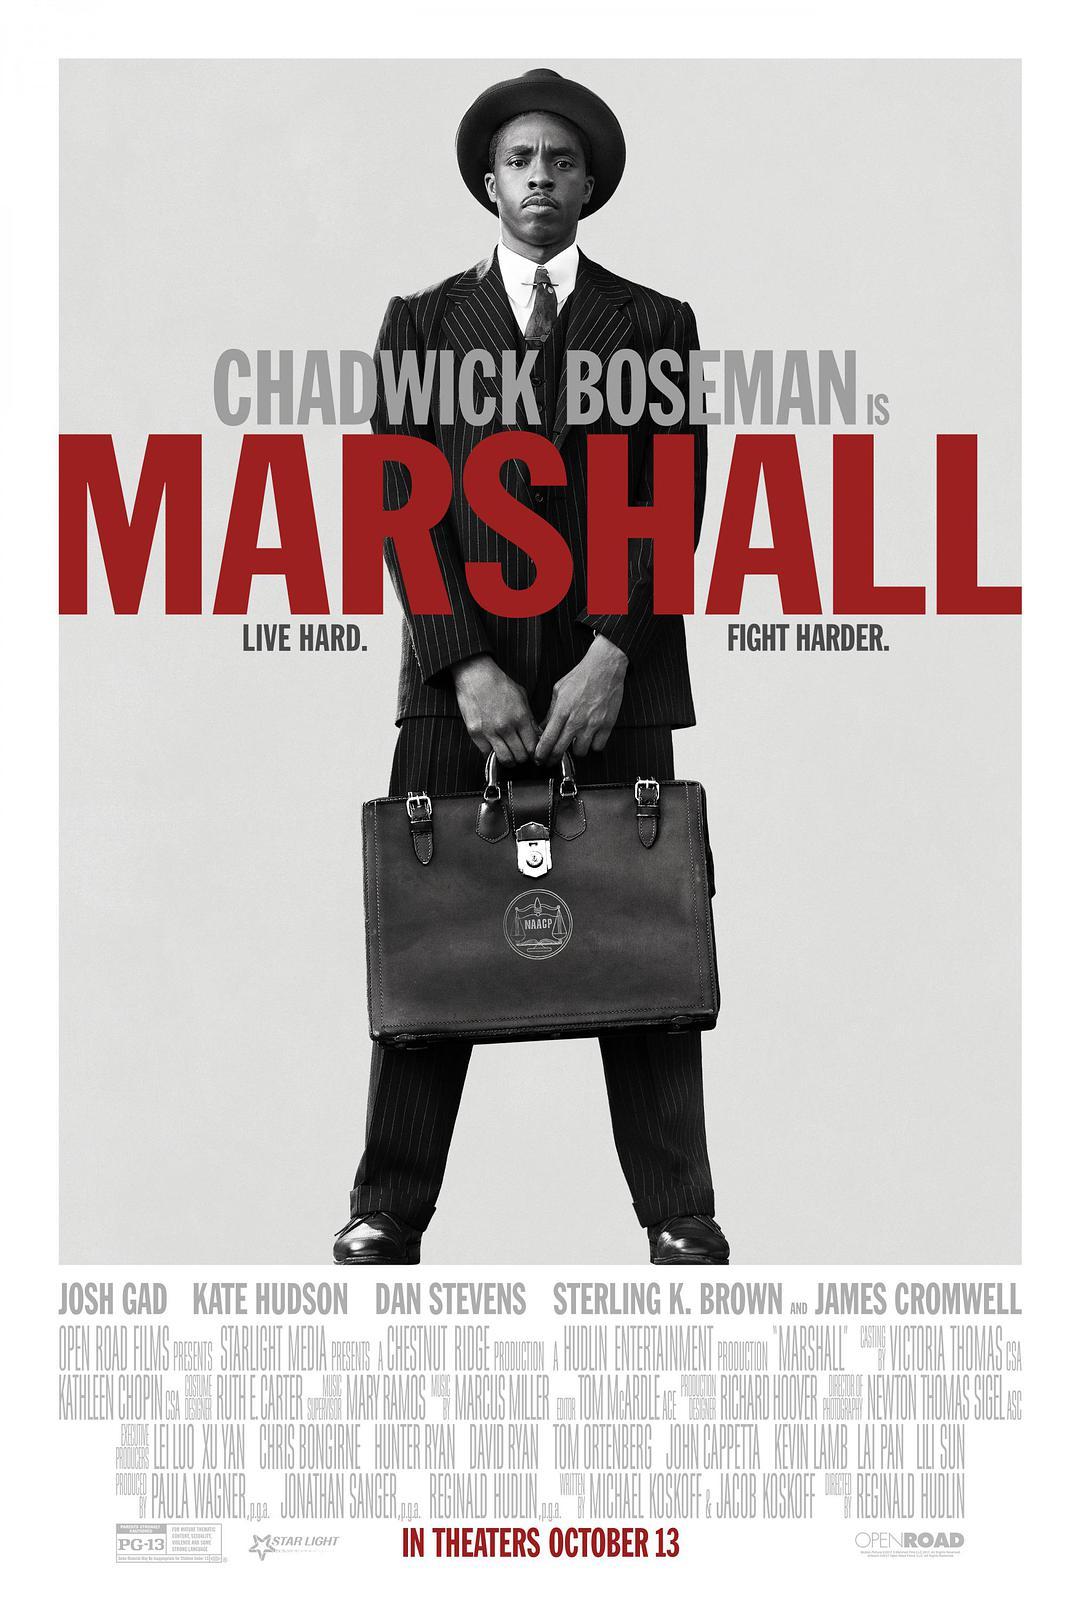 马歇尔 蓝光原盘下载+高清MKV版 2017 Marshall 33.6G